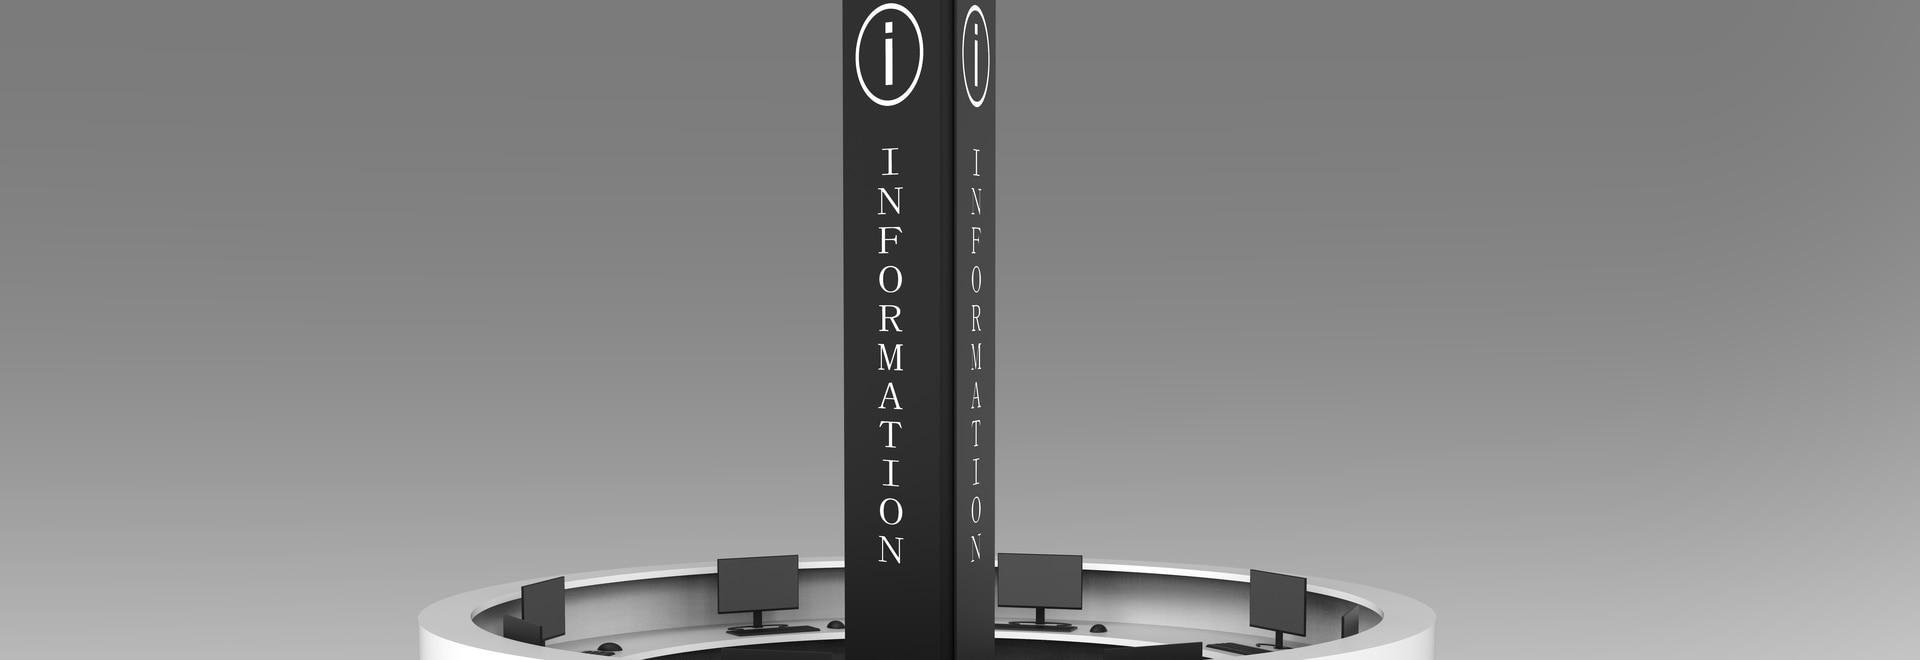 Information Signage